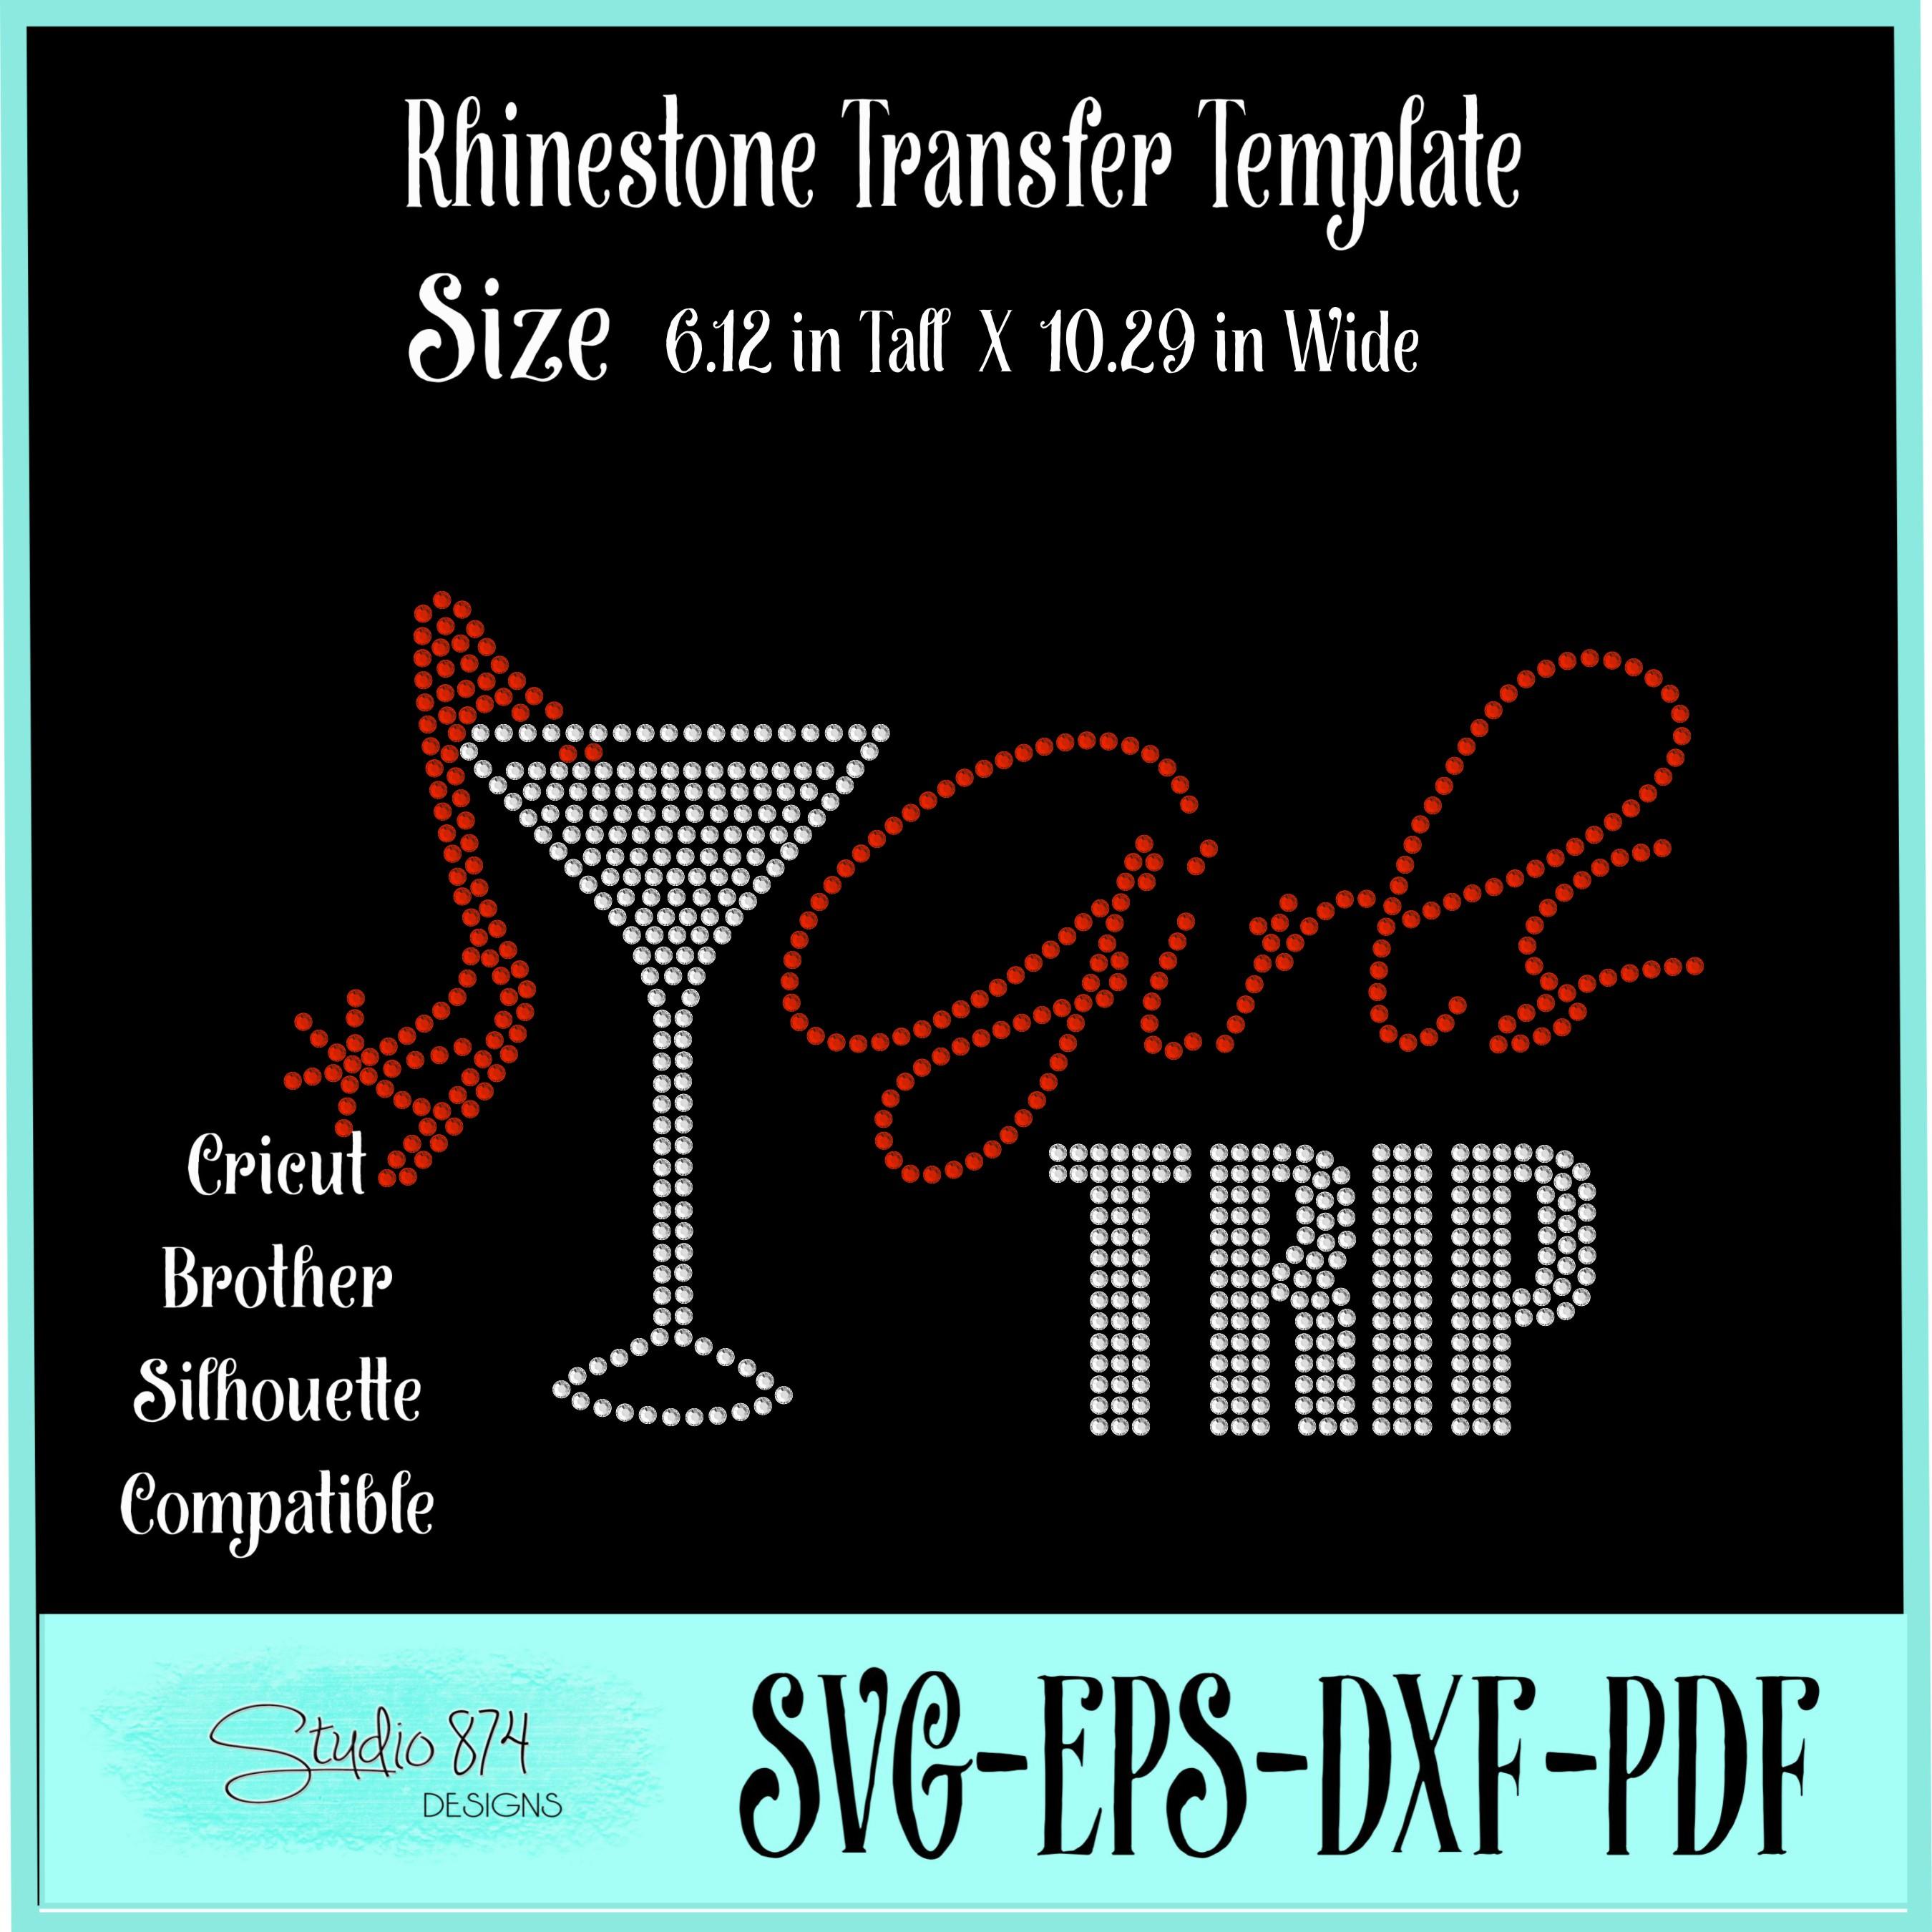 Girls Trip Rhinestone SVG Transfer Template R5 example image 2